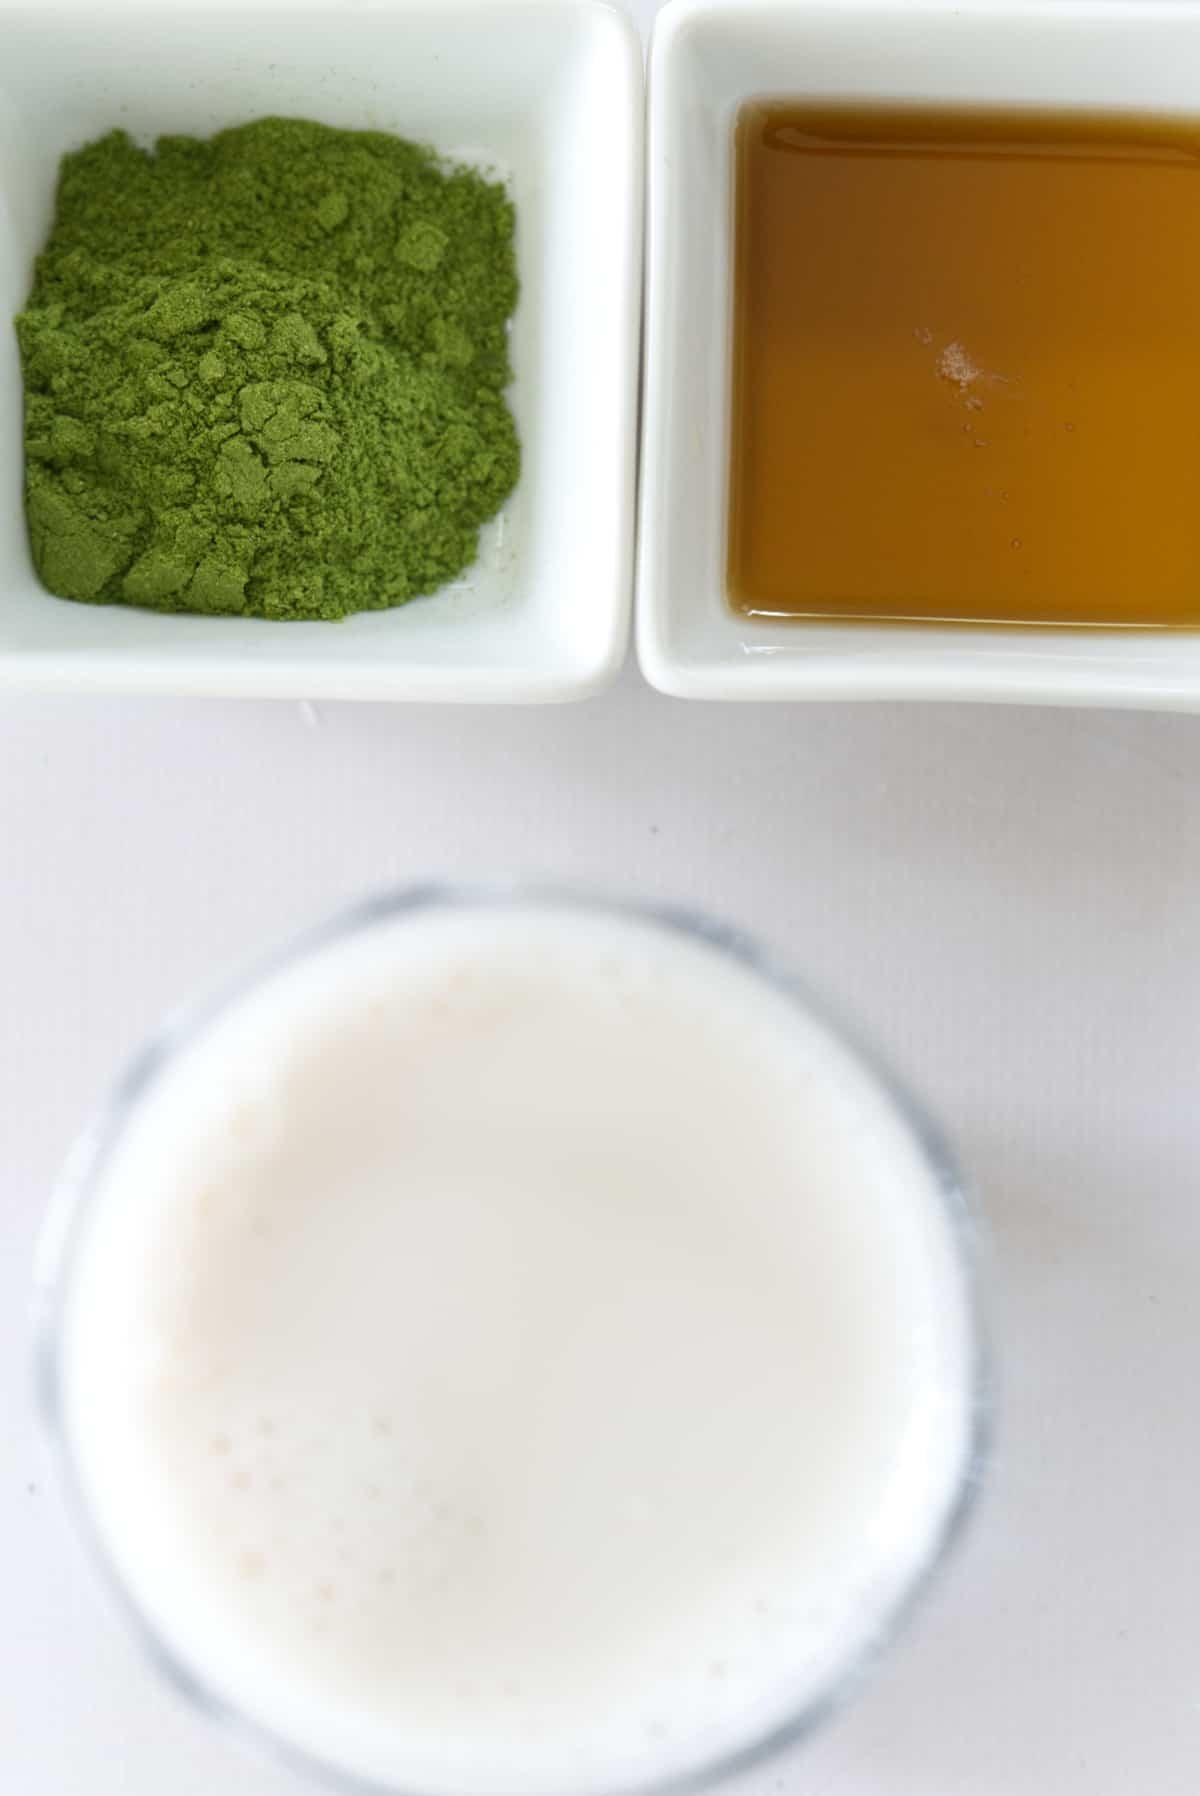 Moringa power, maple syrup and almond milk